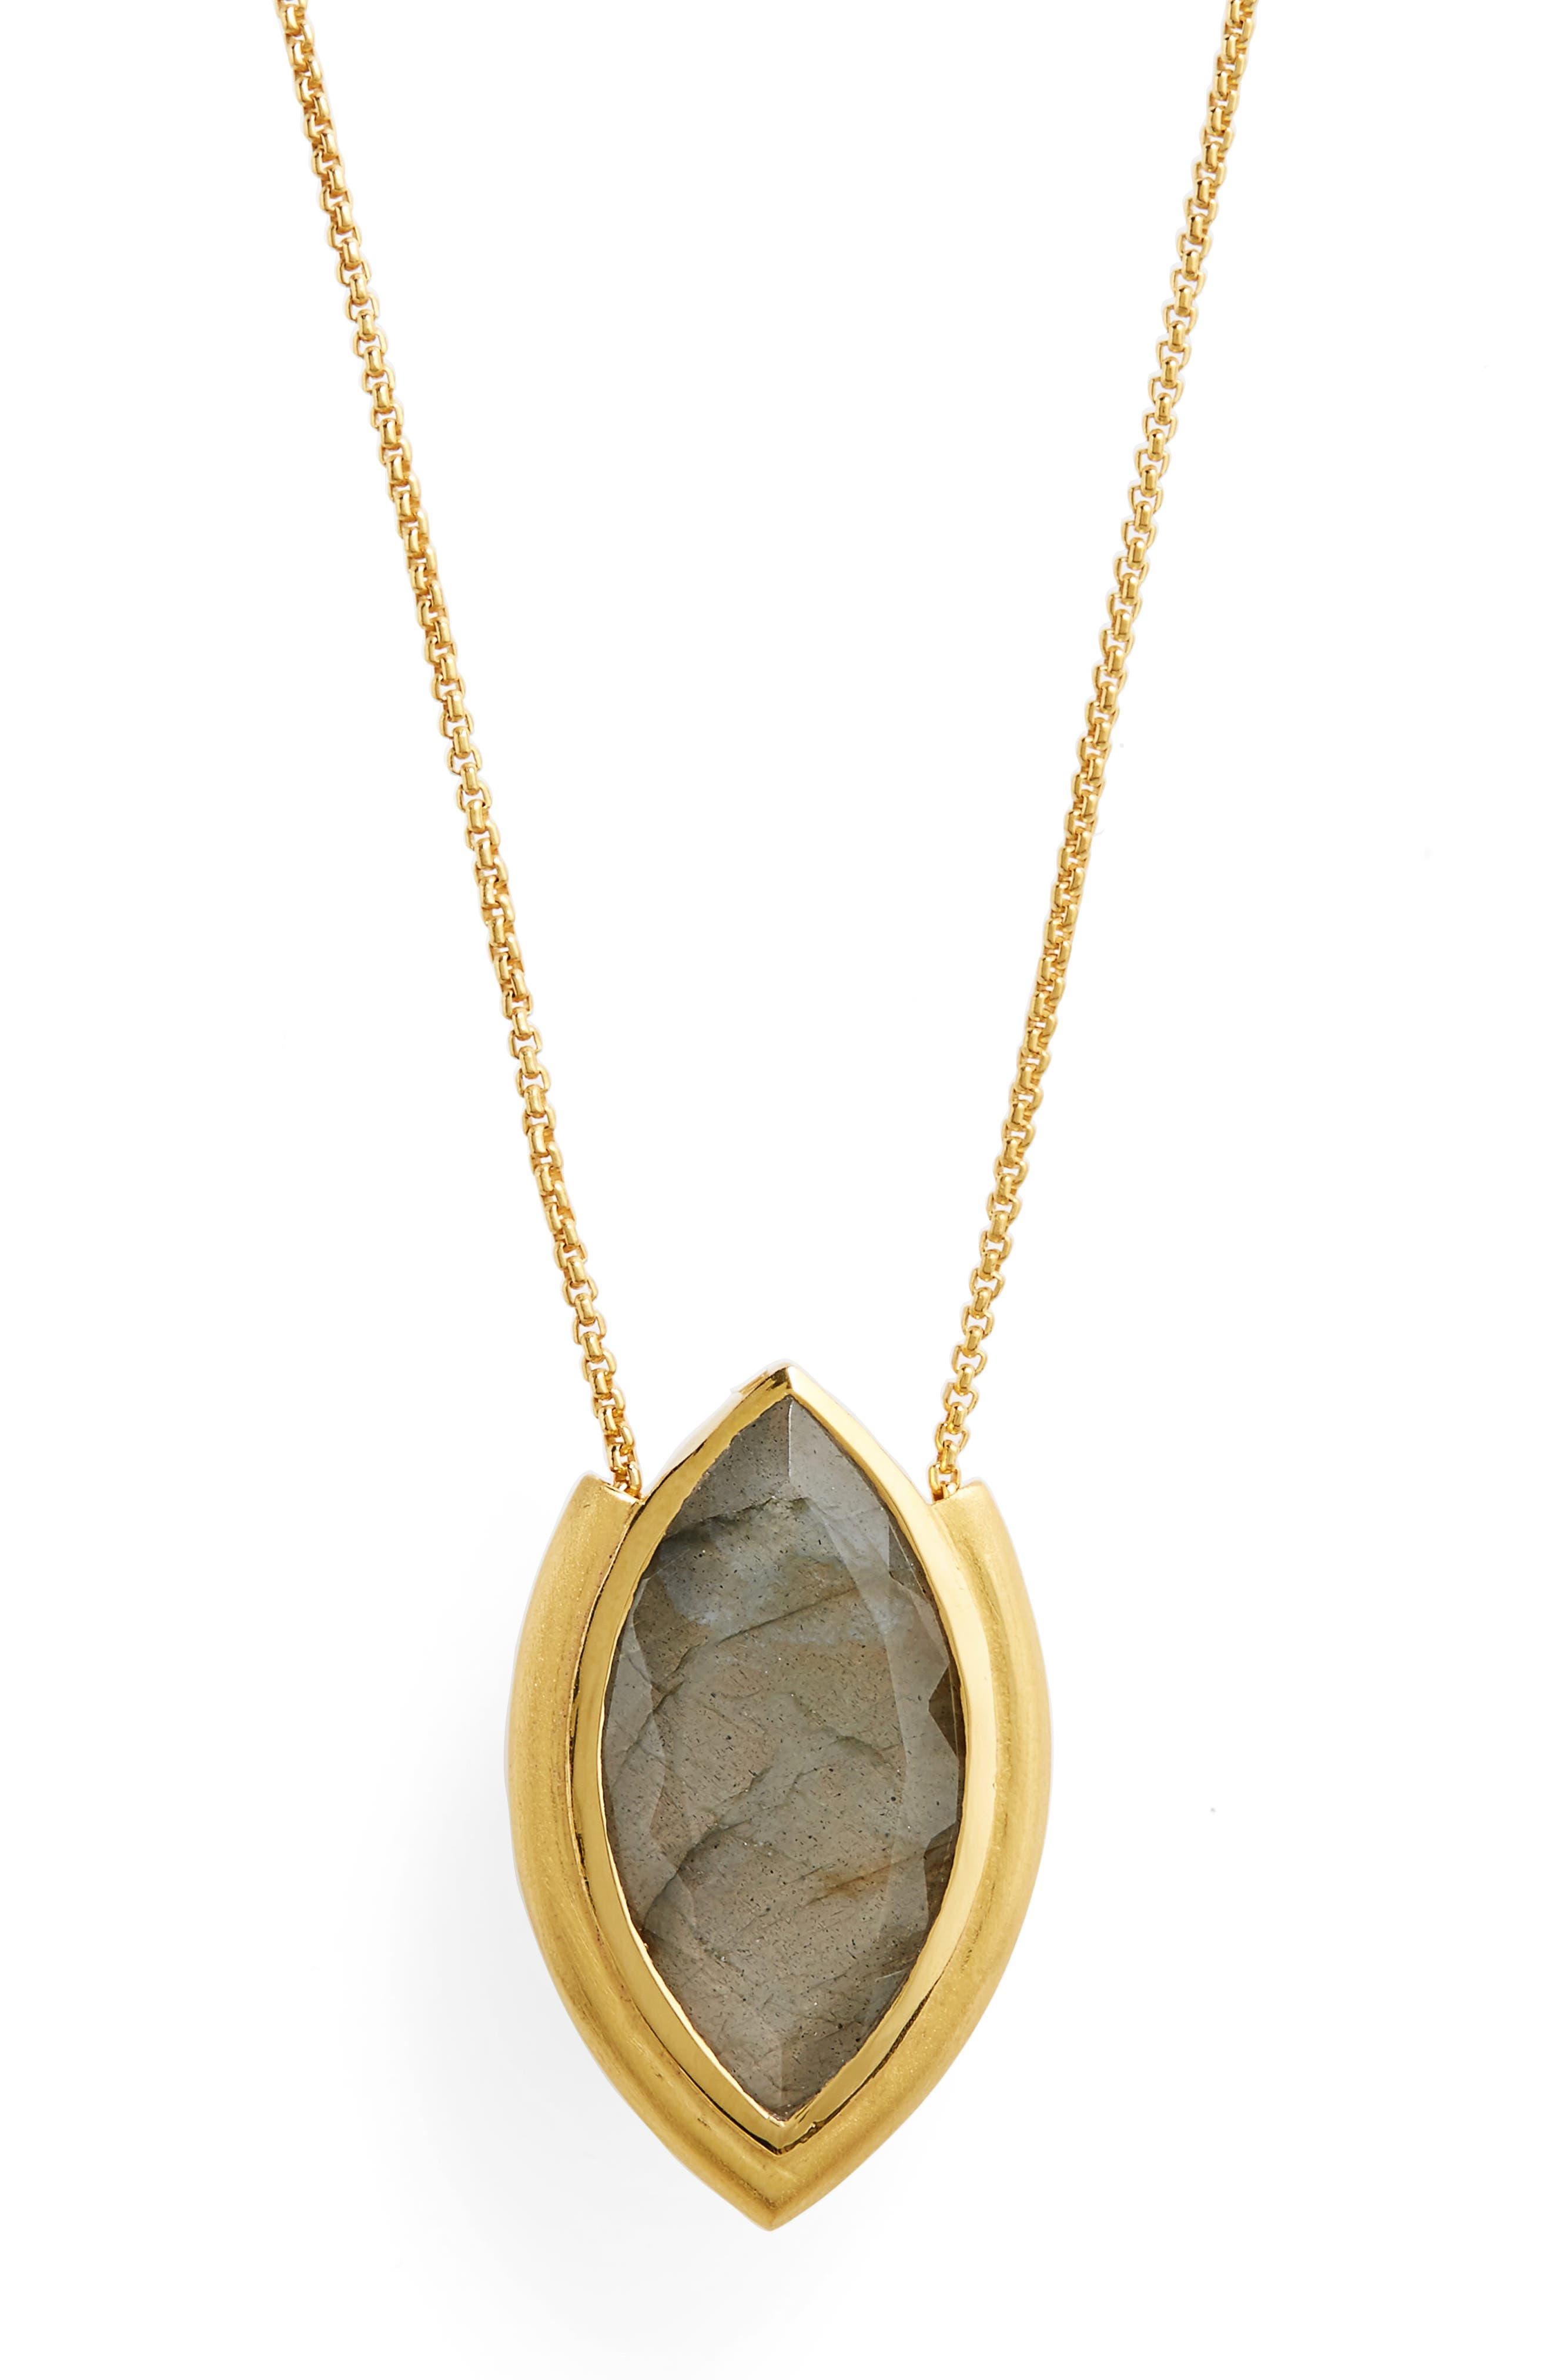 Lotus Pendant Necklace,                             Alternate thumbnail 2, color,                             Labradorite/ Gold